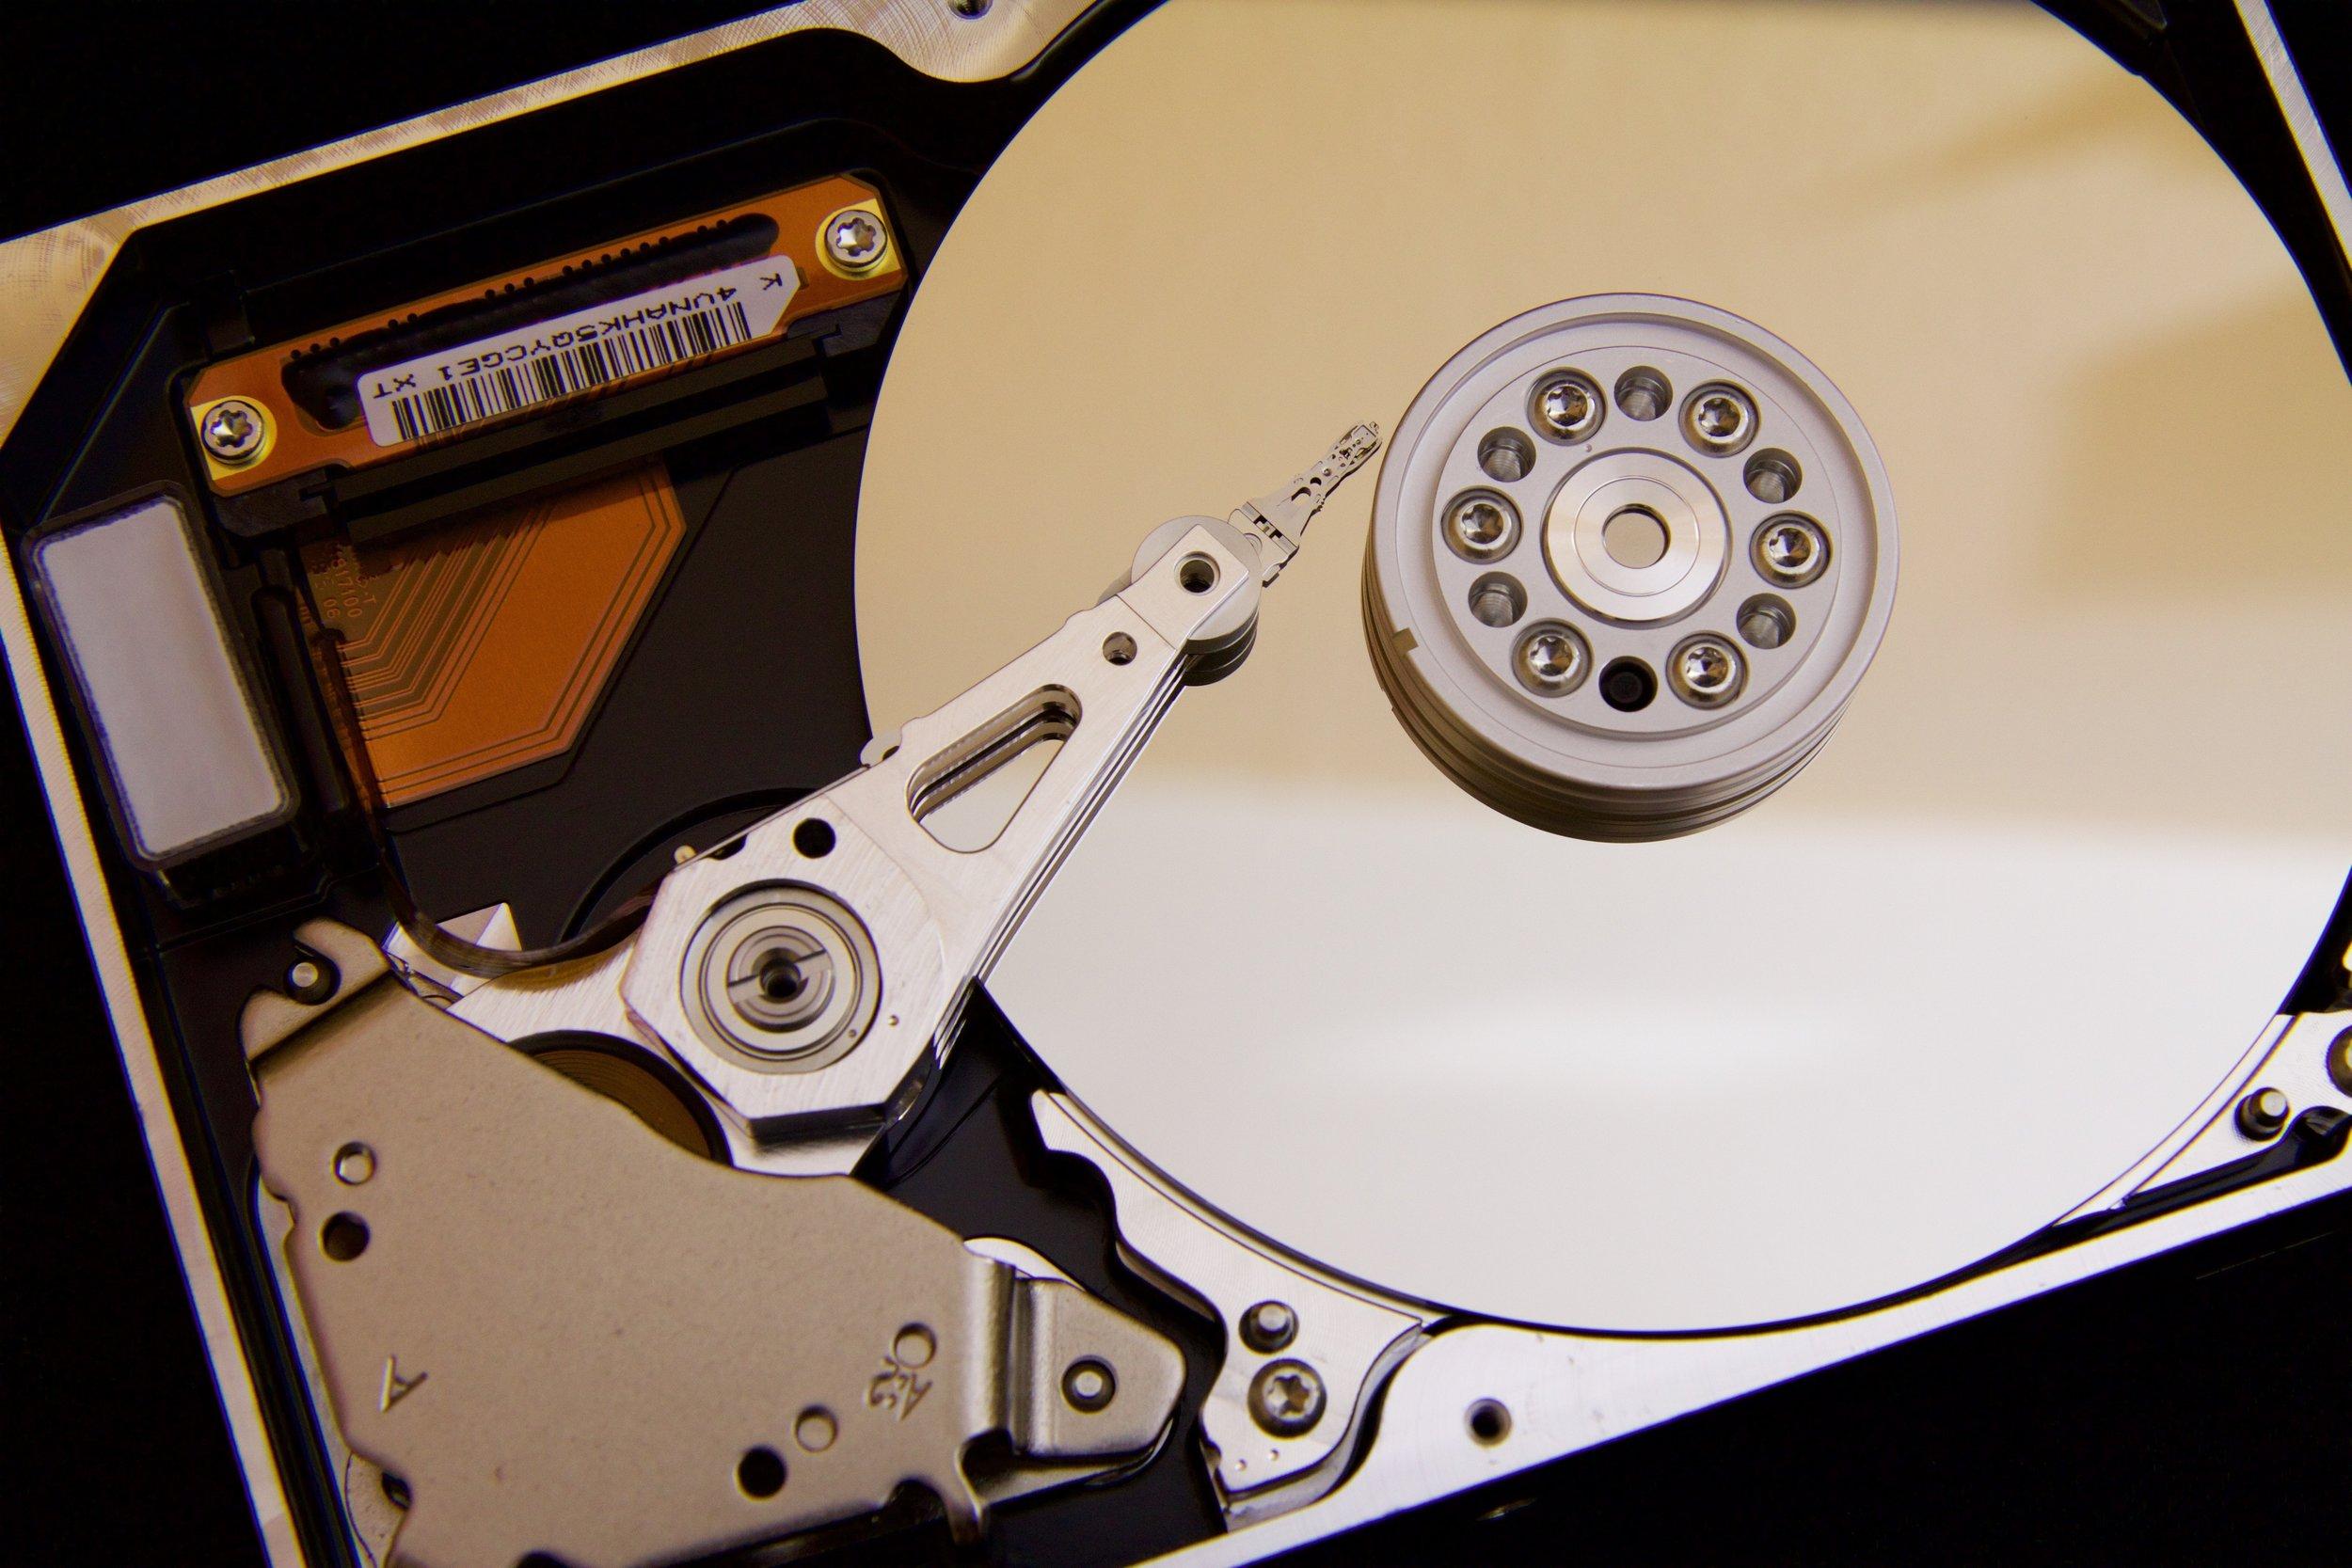 backup_plan3_hard_drive.jpg